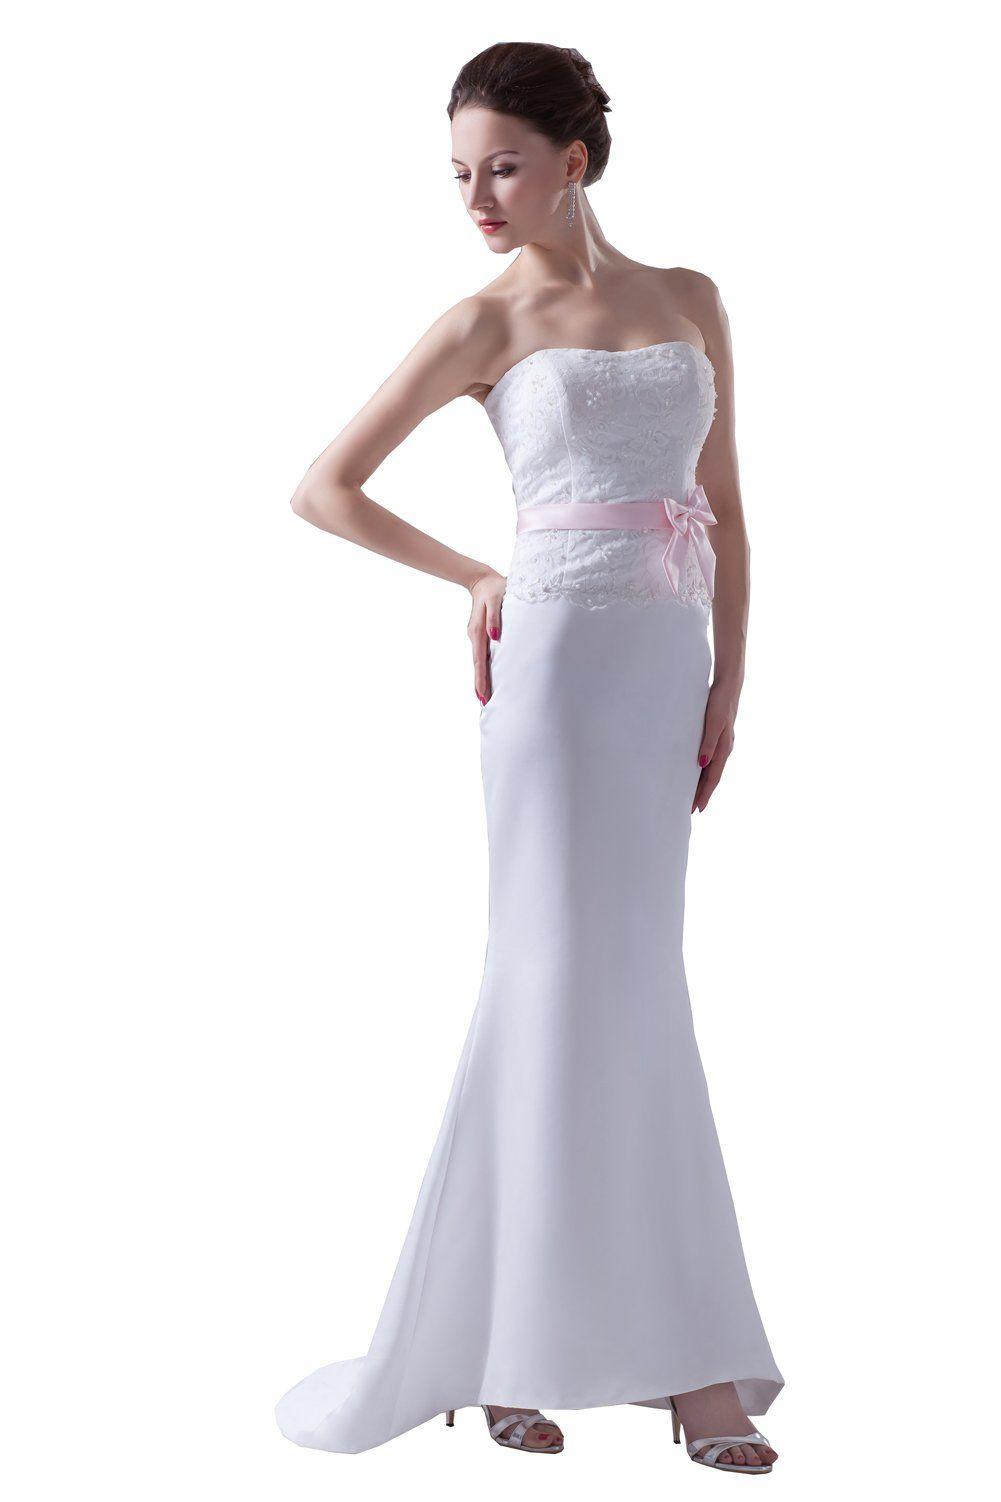 Desimpler womenus strapless lace satin mermaid bridal gown long